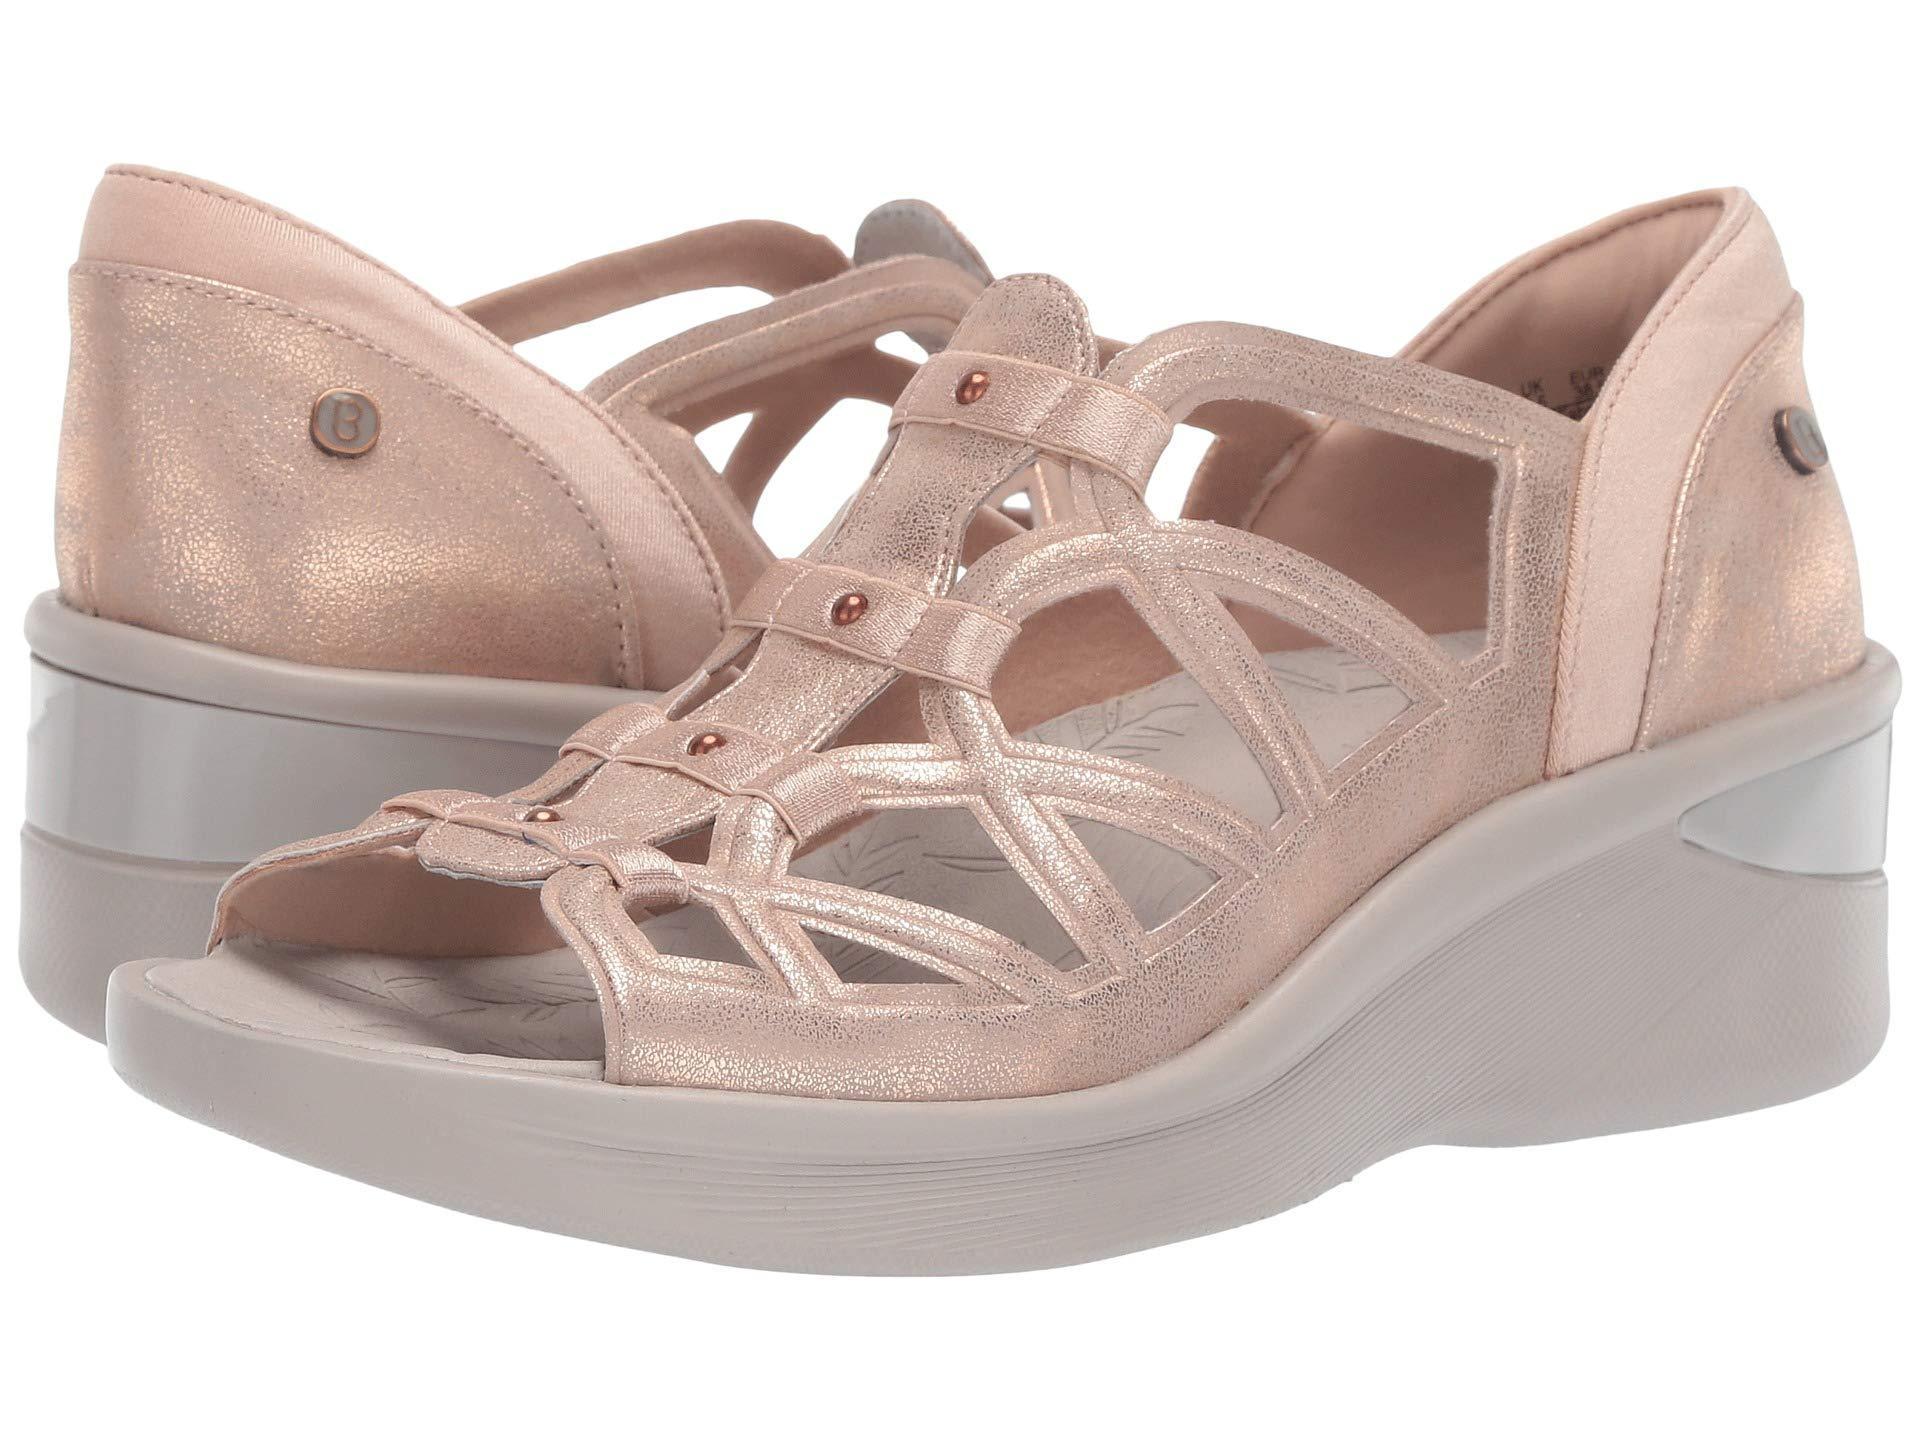 91567178e3 Lyst - Bzees Sasha (pewter Metallic) Women's Sandals in Metallic